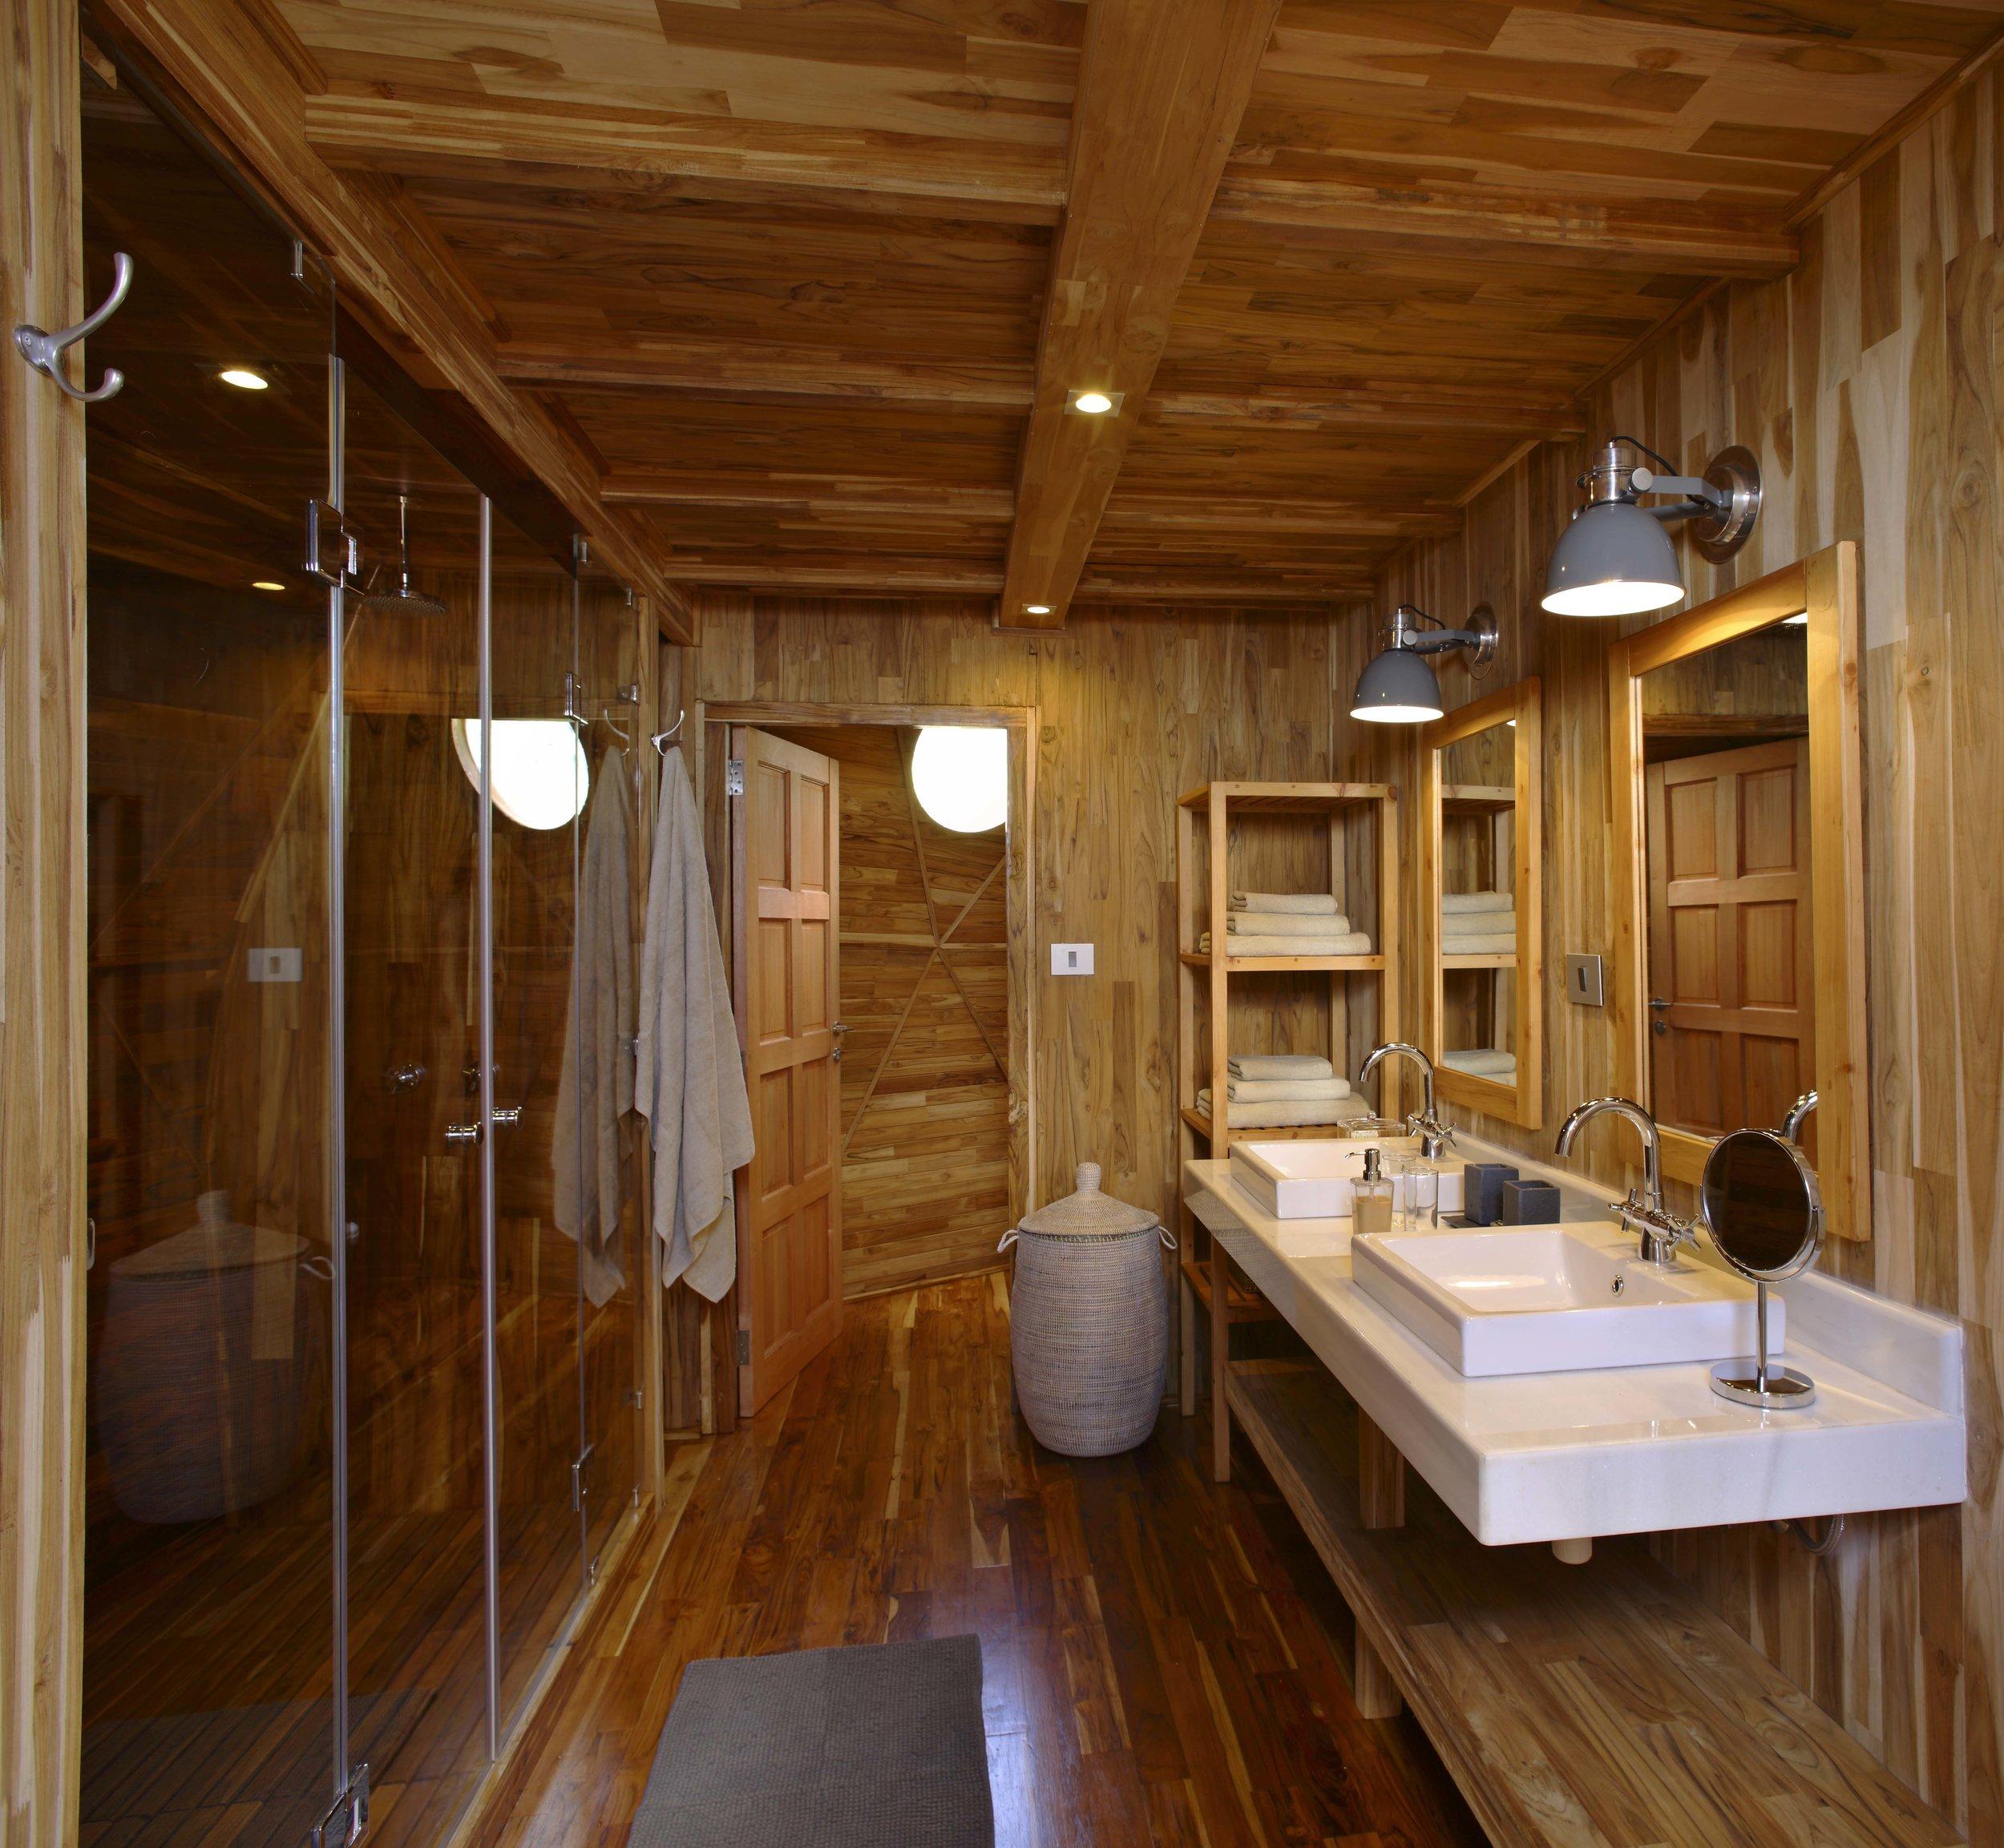 The-Highlands-bathroom.jpg